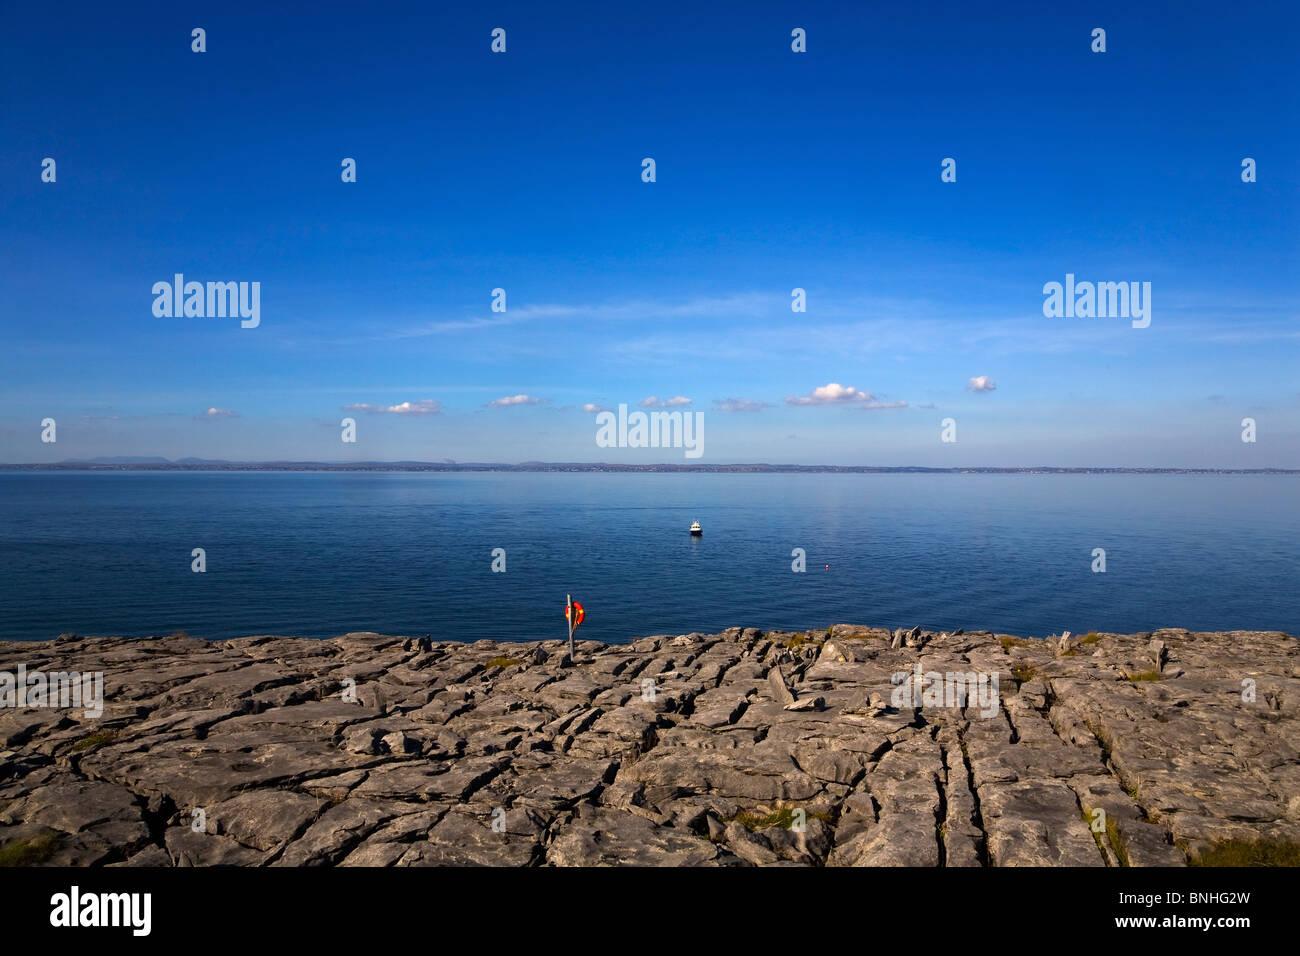 Kalkstein Pflaster, Burren, County Clare, Irland Stockbild